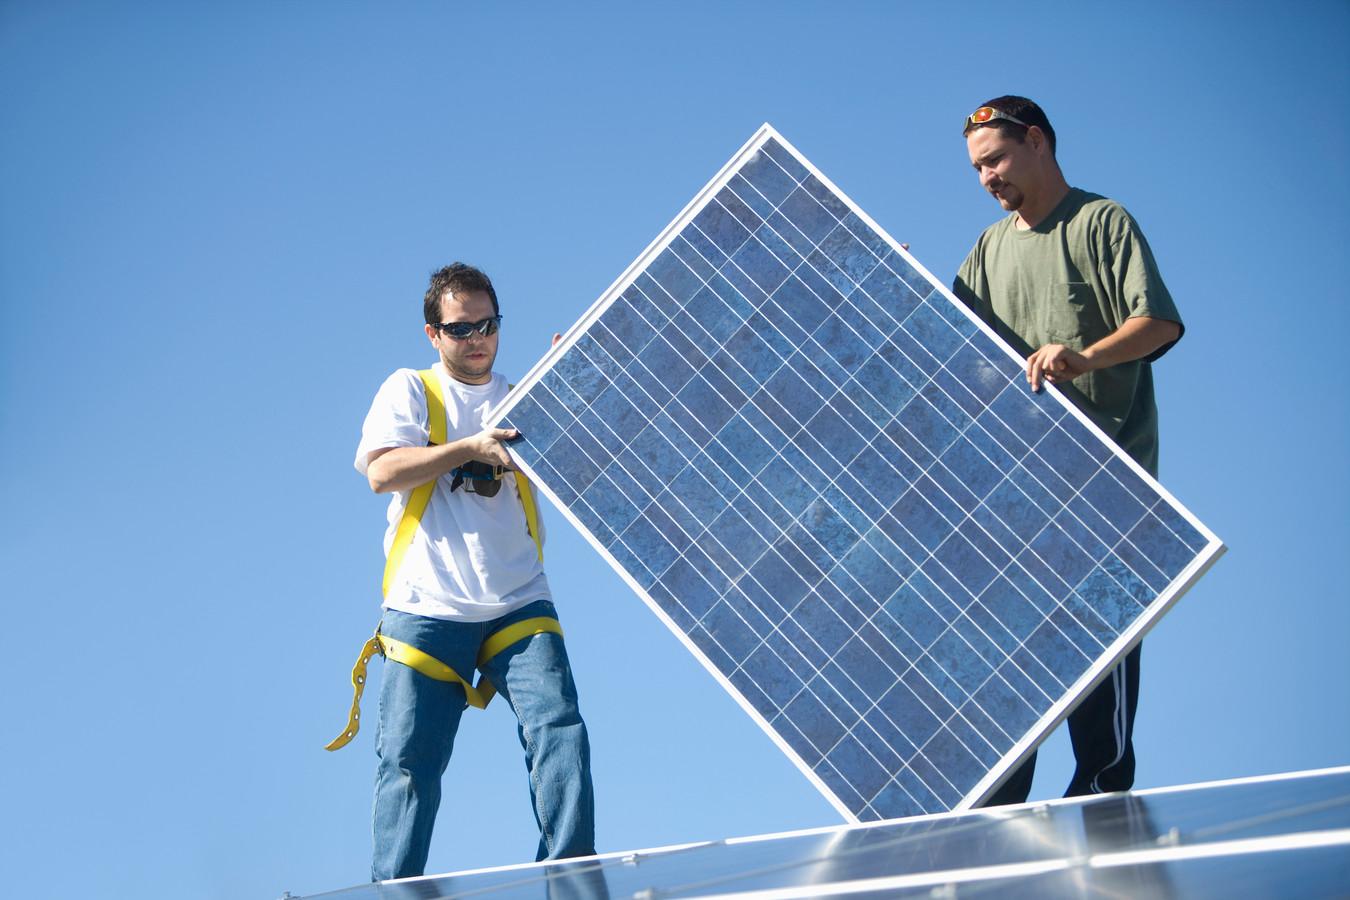 Two men lifting a solar panel stockadr zonnepaneel zonnepanelen zonne-energie groene energie duurzame